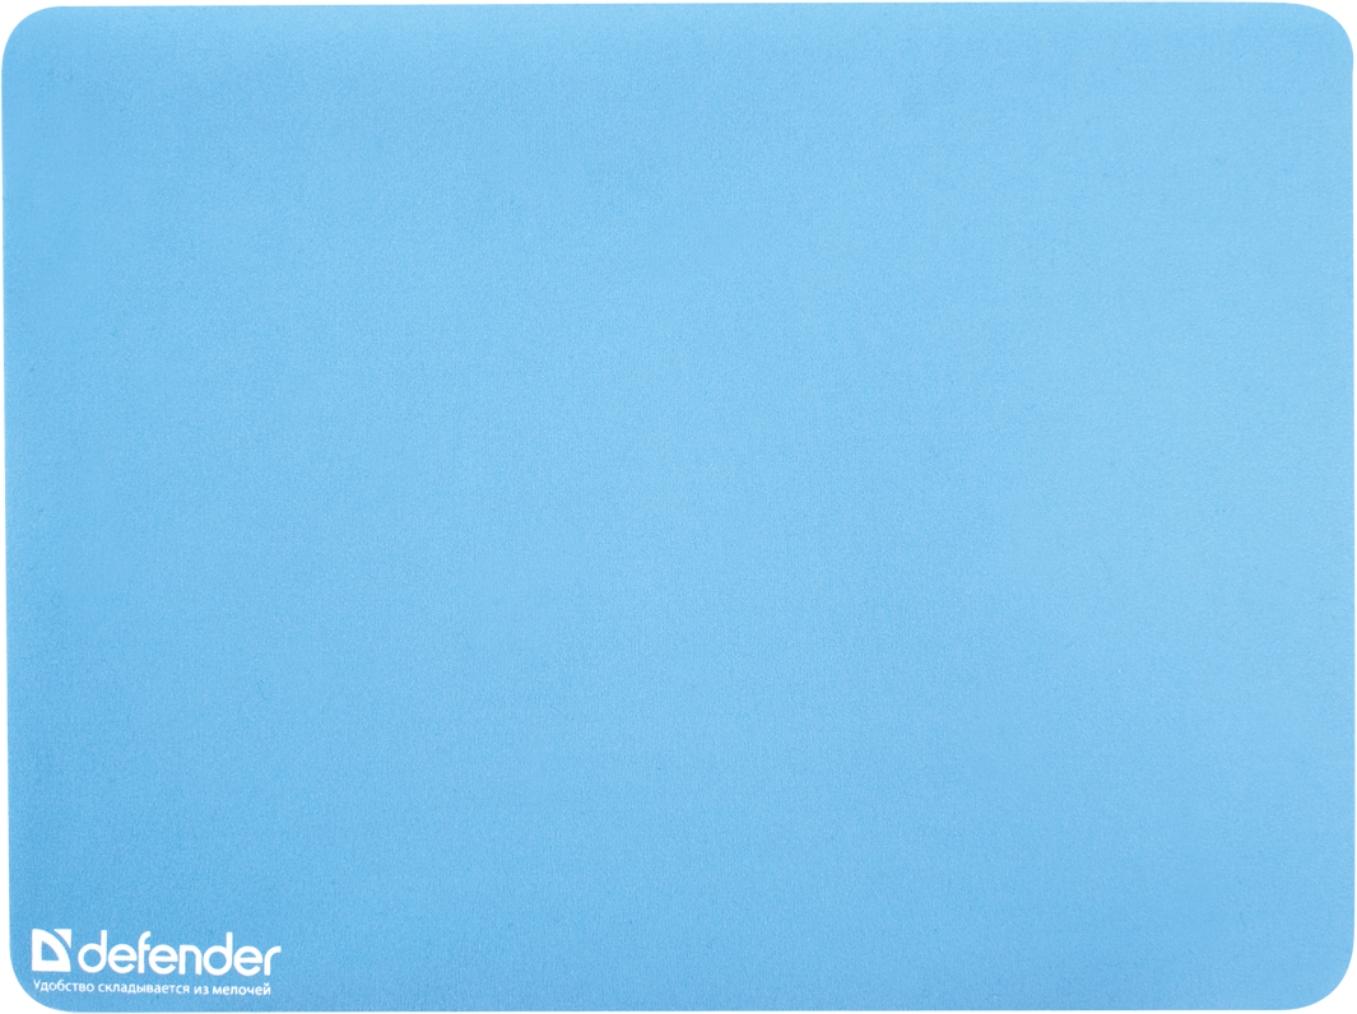 Коврик для компьютерной мыши Notebook Microfiber, 300х225х1.2мм., асорти, ассорт. Defender - фото 1